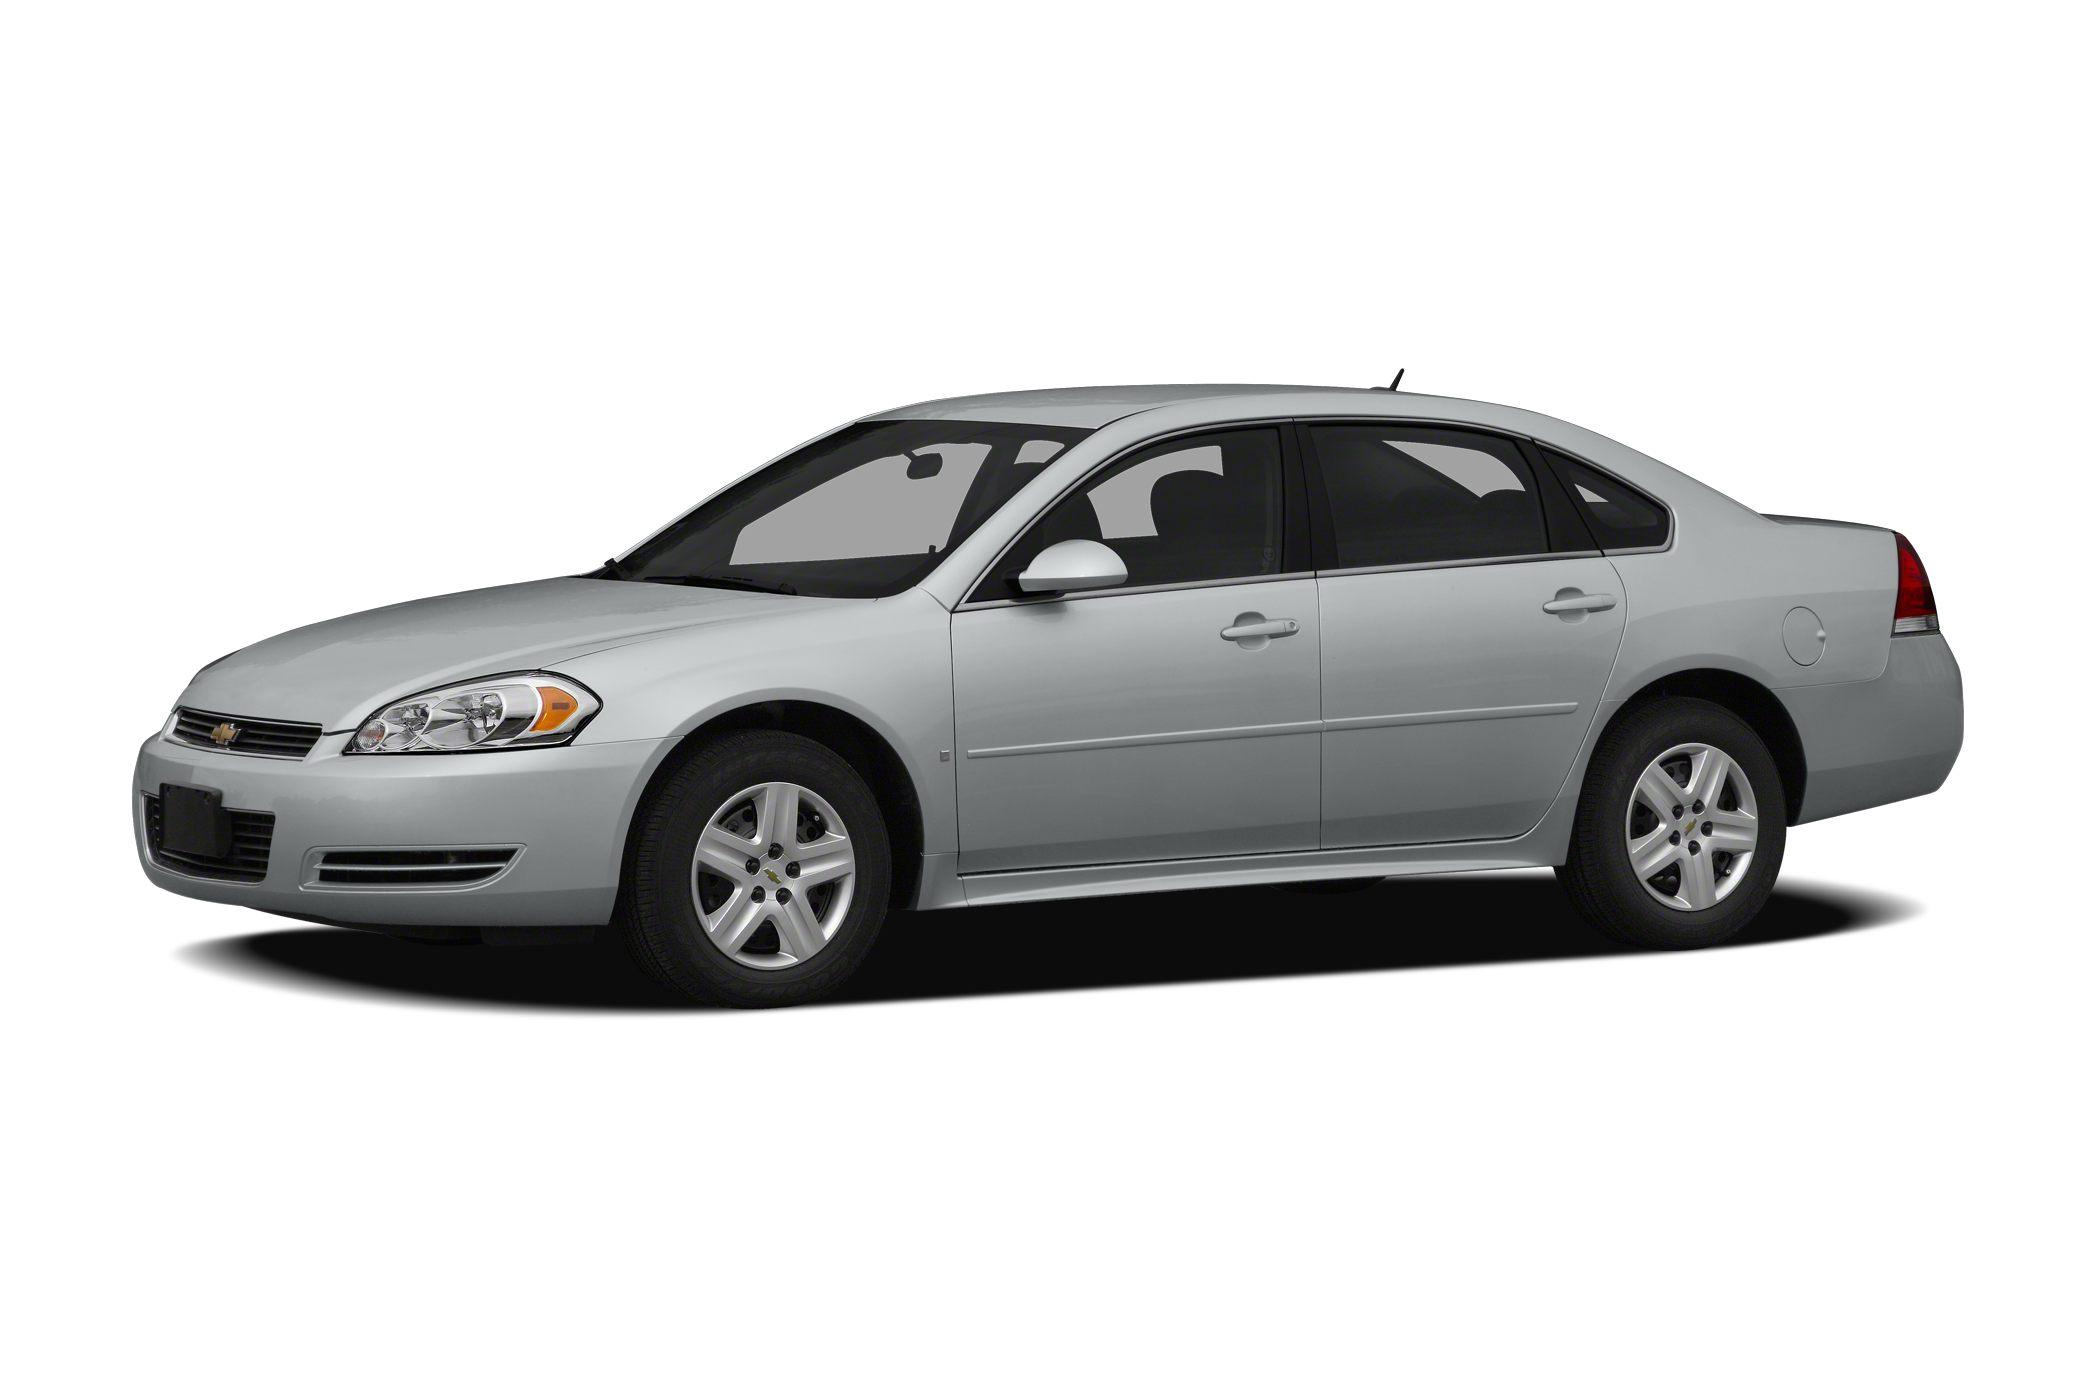 2012 Chevrolet Impala New Car Test Drive